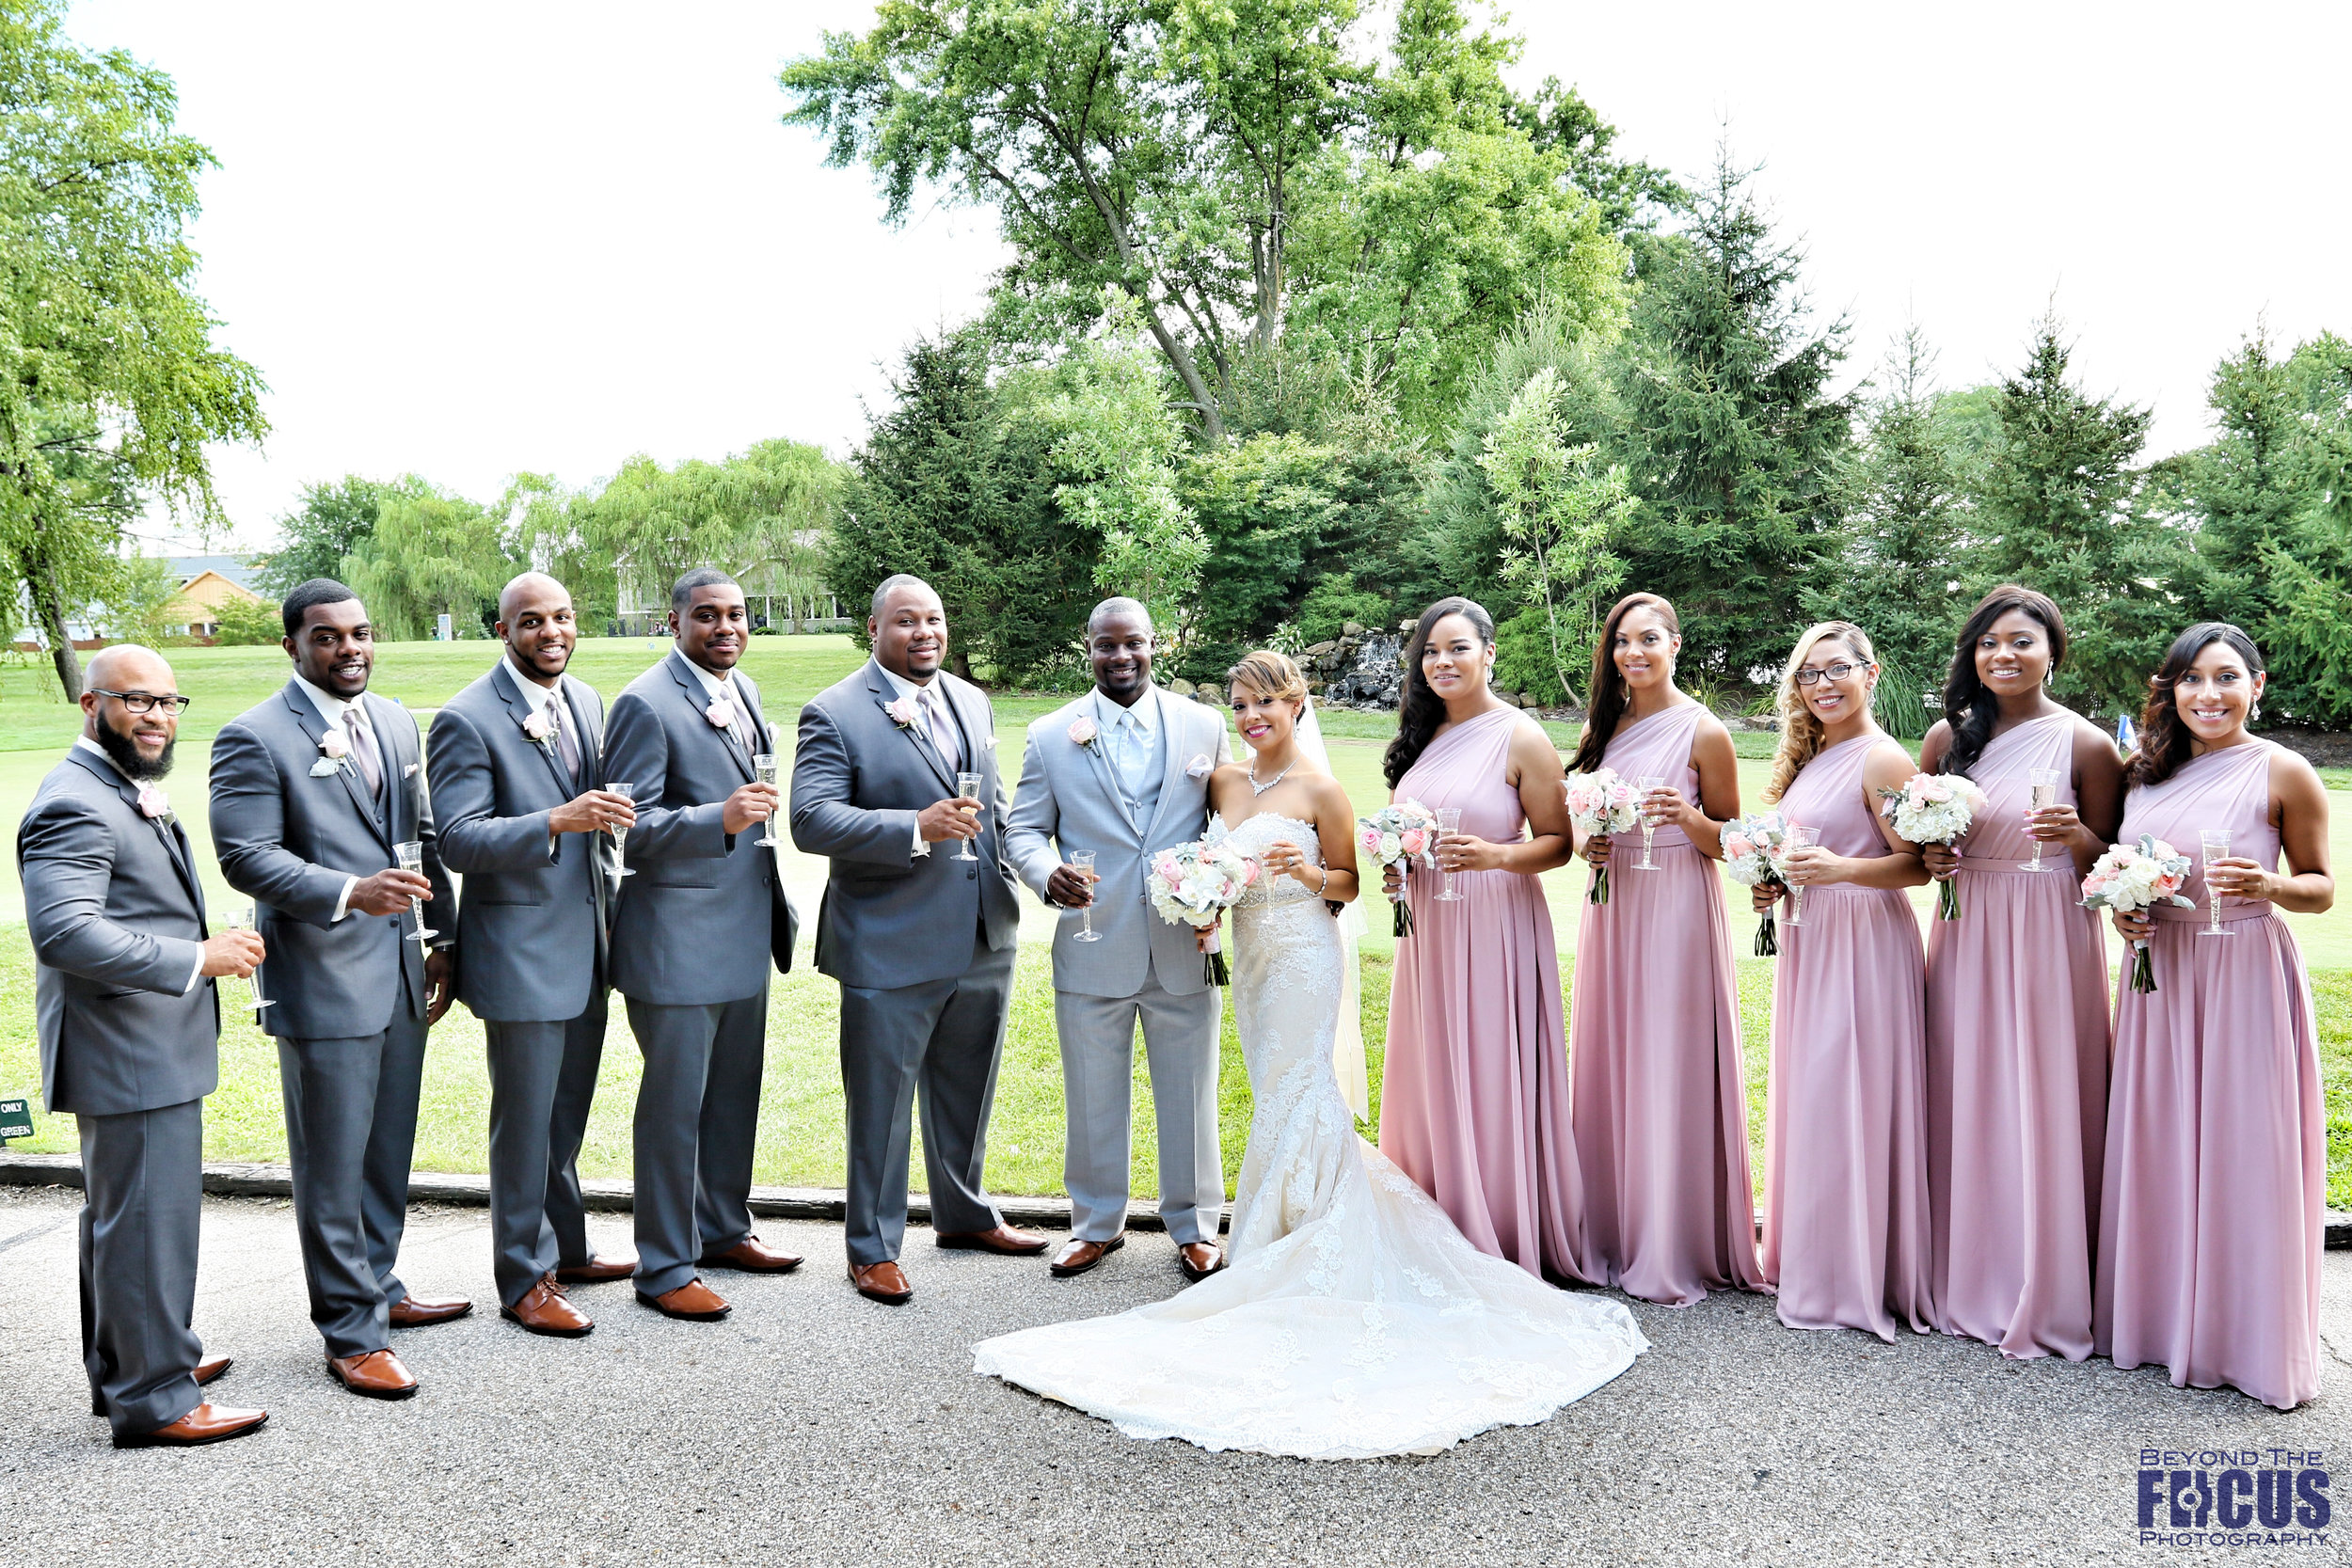 Palmer Wedding - Wedding Ceremony62.jpg